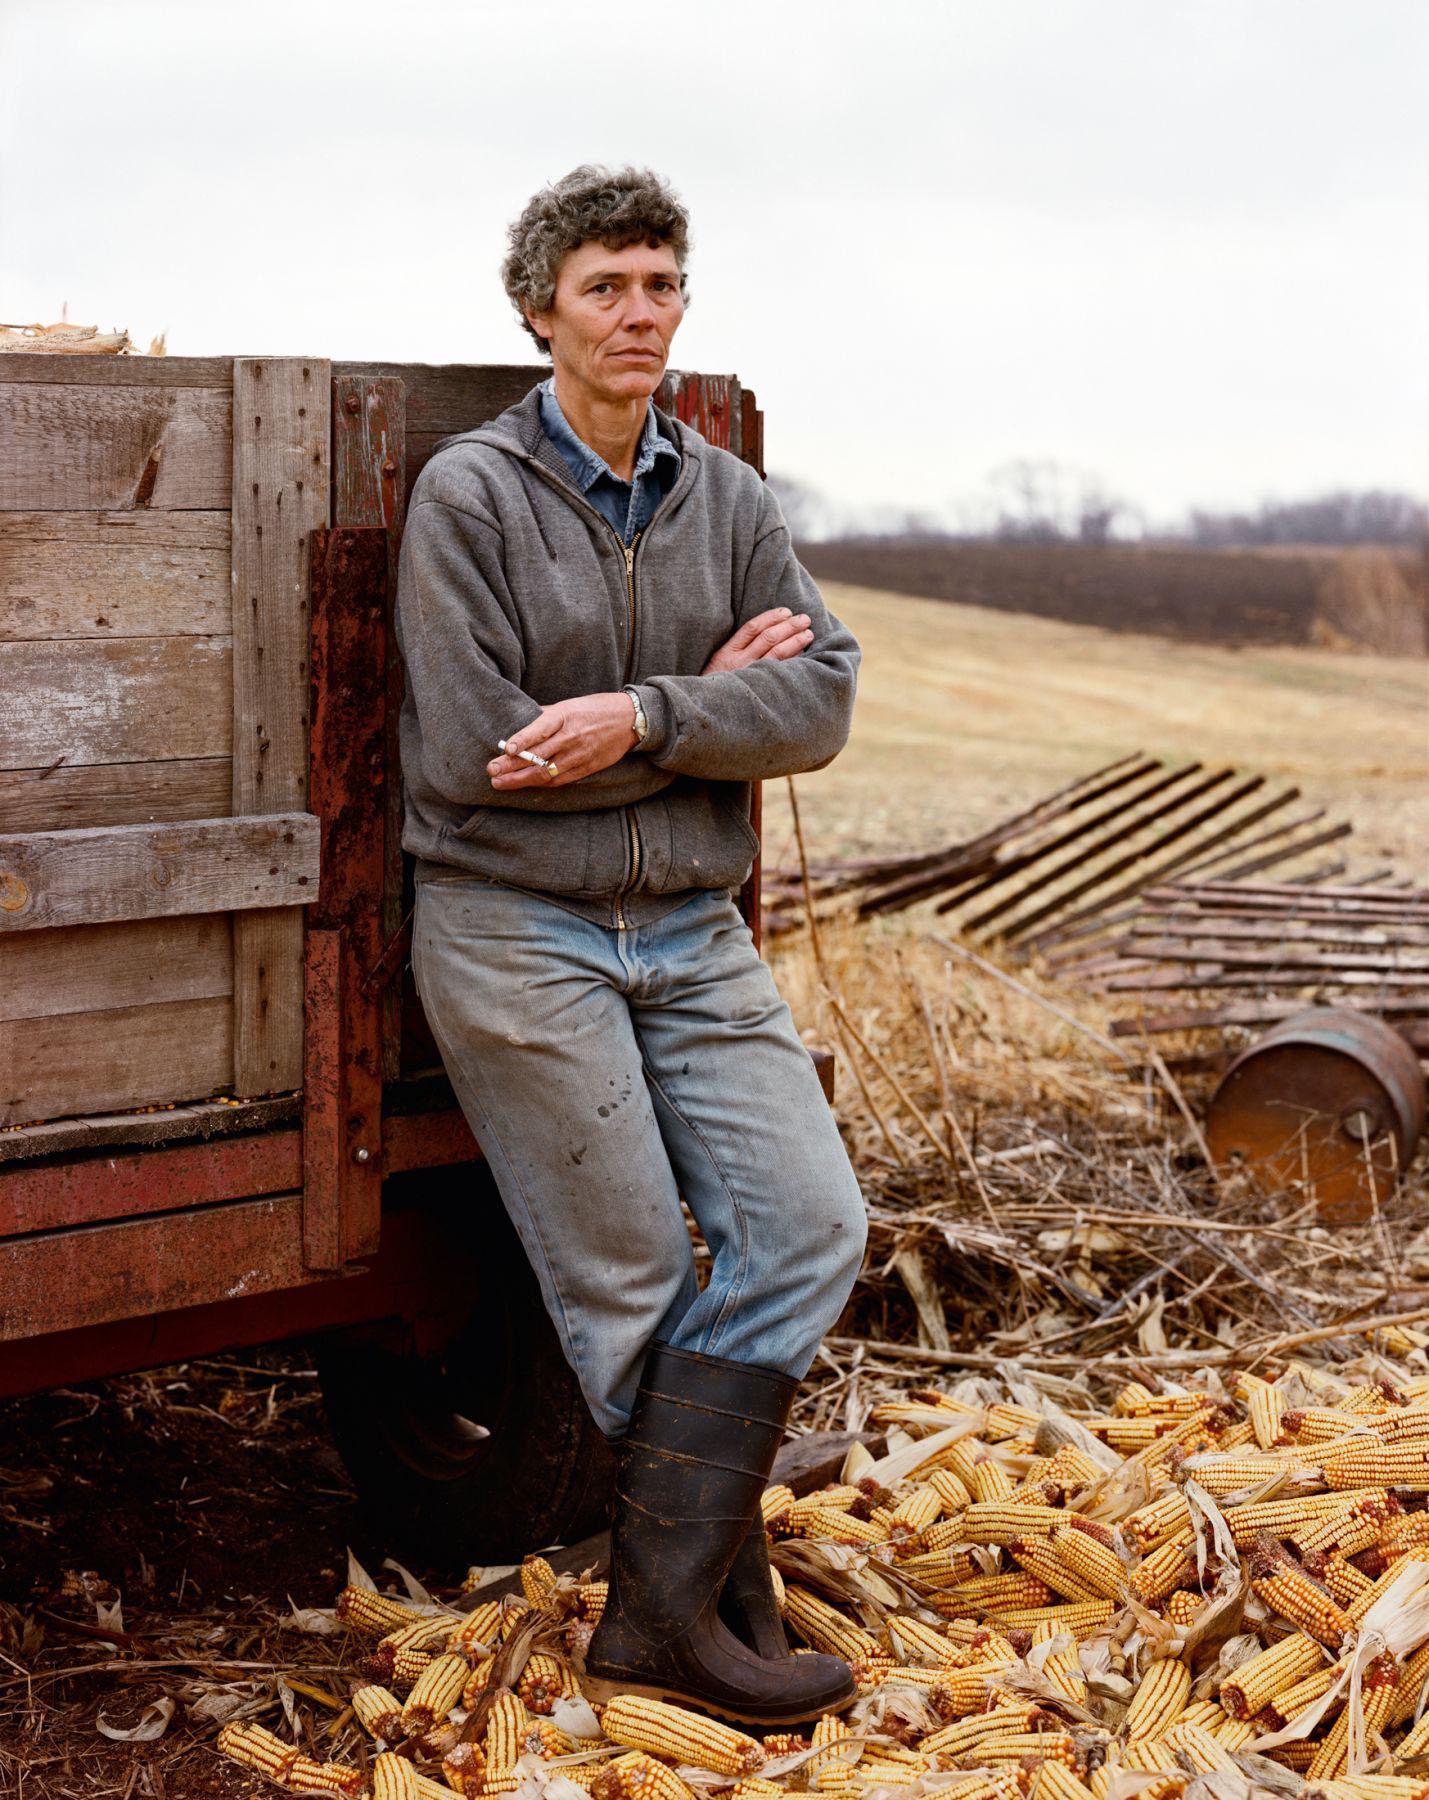 A Farmer Taking a Break, Iowa, She has Cancer of the Thyroid, November 1986